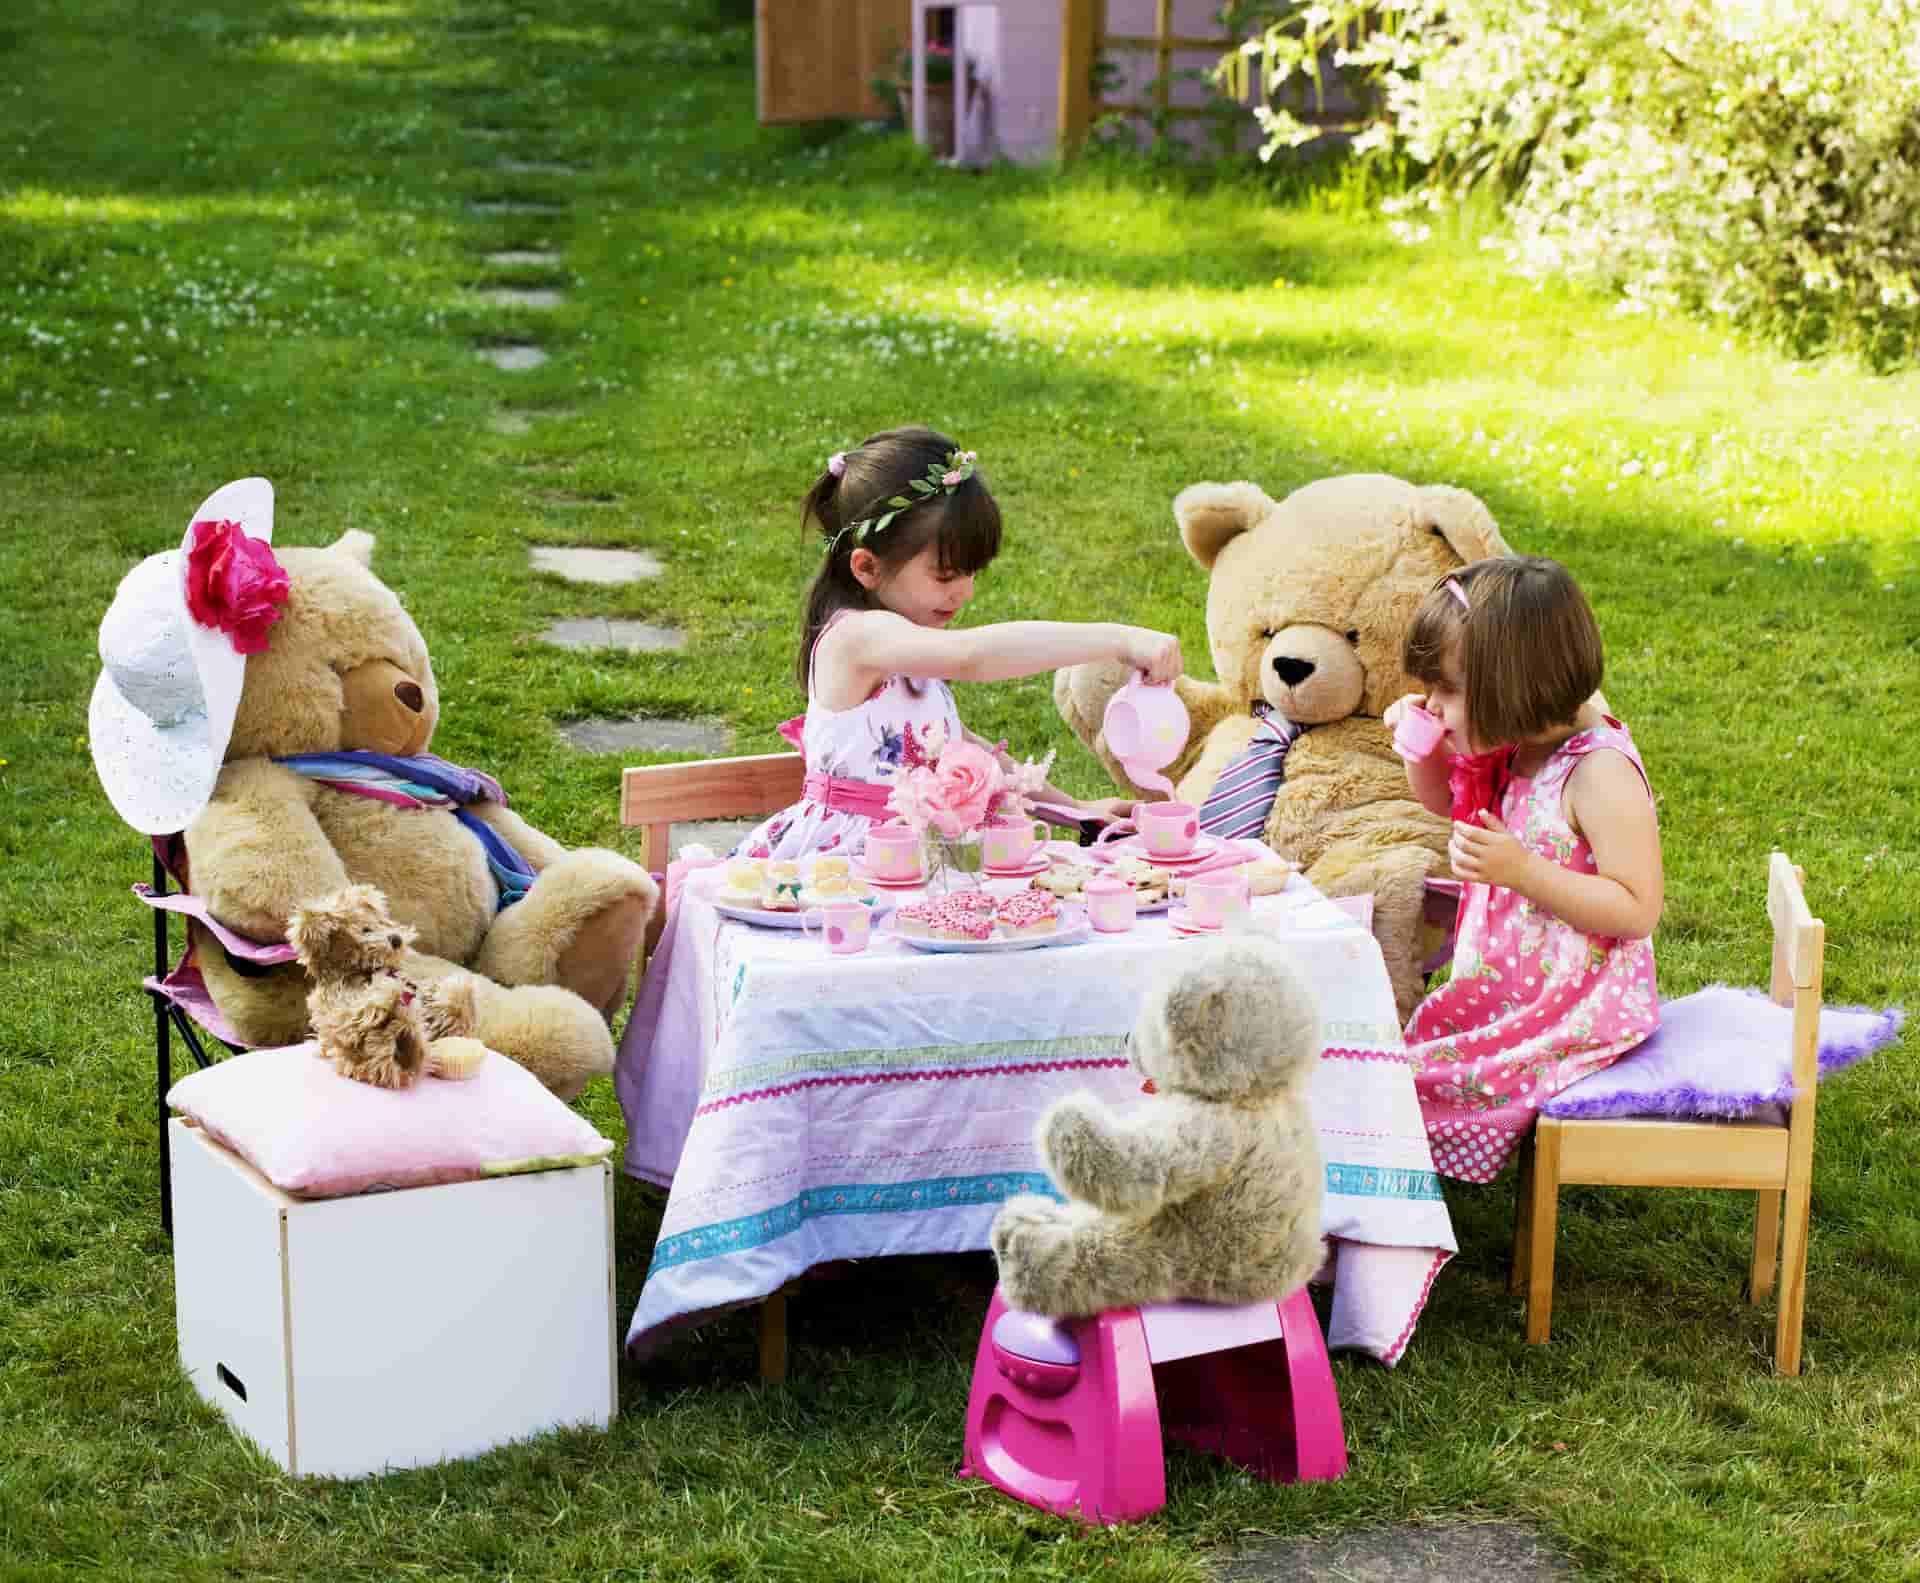 young girls having a teddy bear picnic